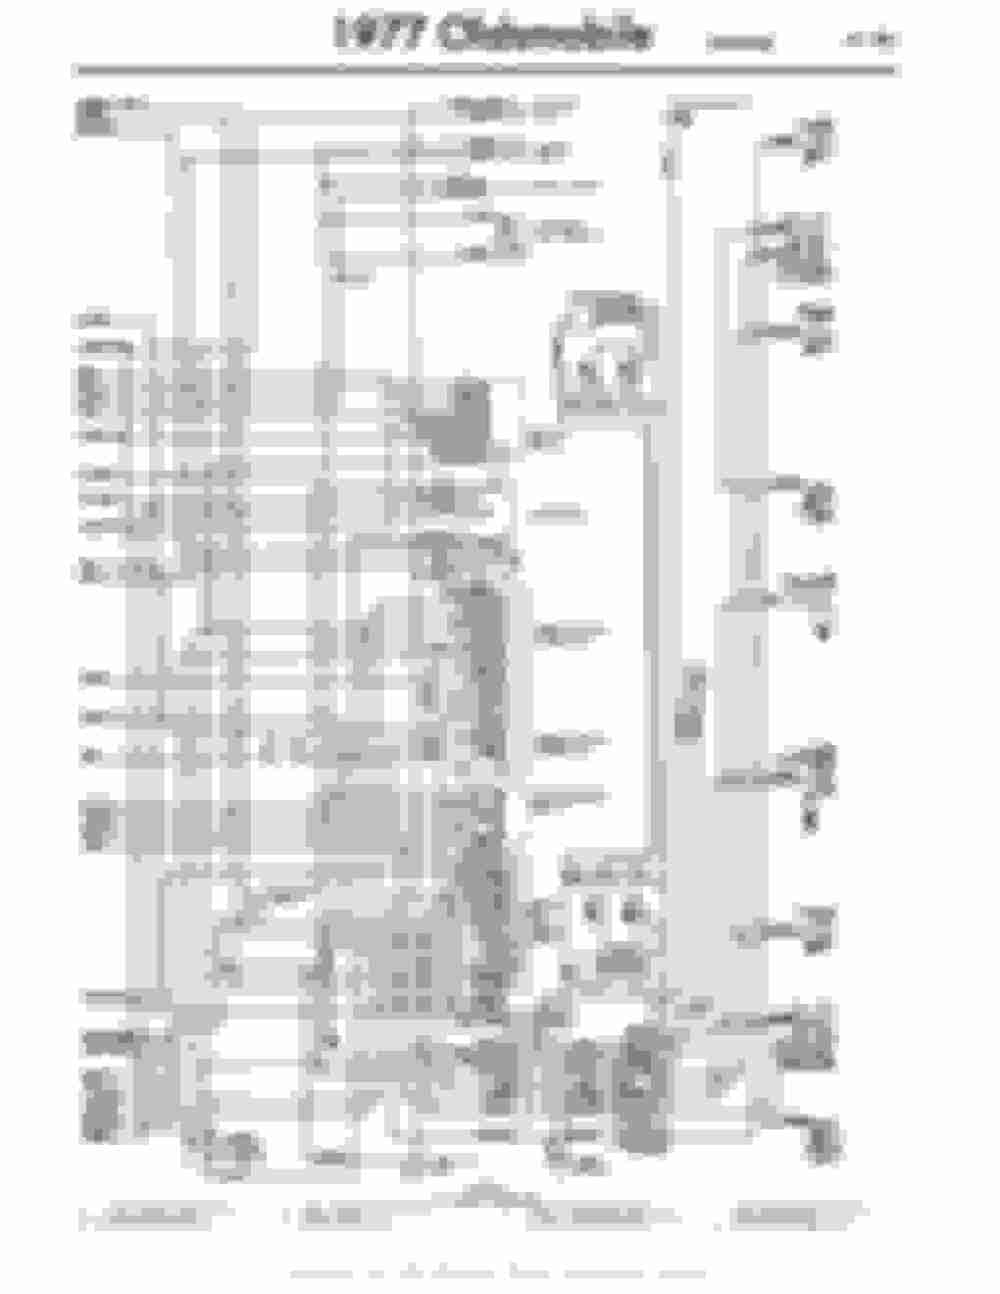 medium resolution of 77 toronado wiring diagram classicoldsmobile com1977 toronado chassis wiring page 2